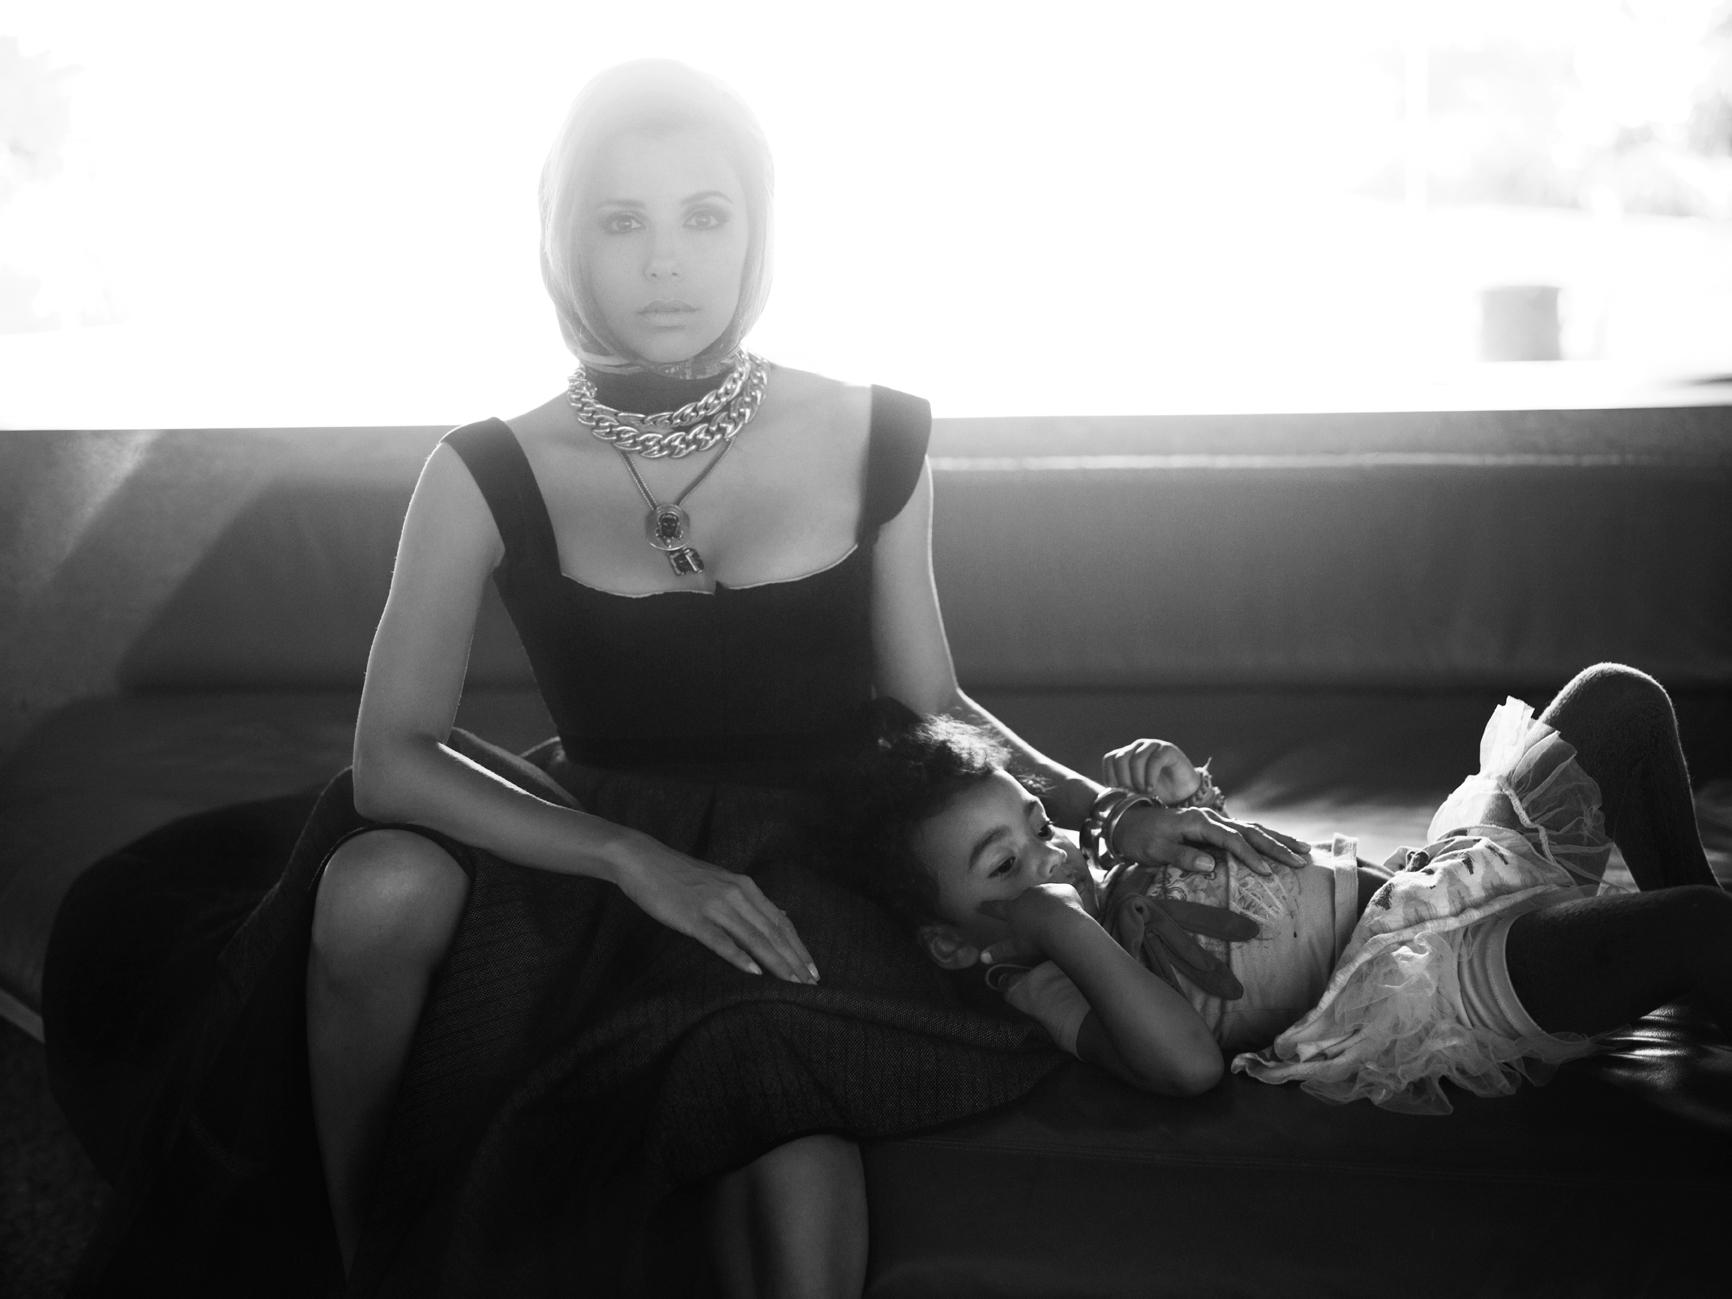 All above Eva longoria photo shoot